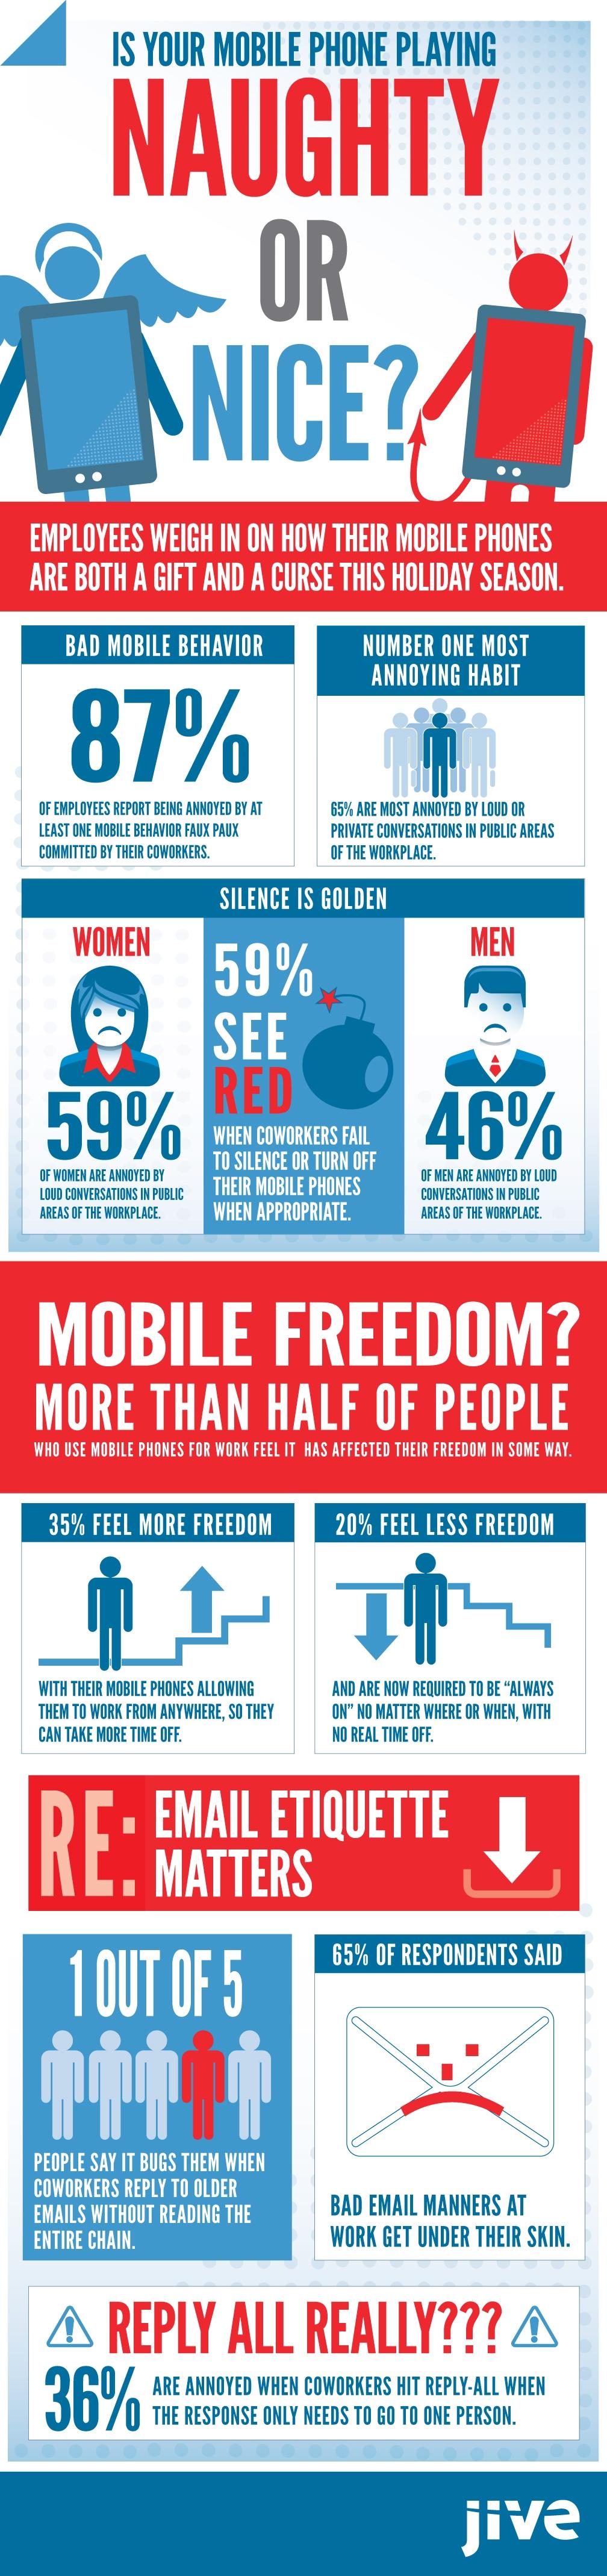 Jive mobile behavior infographic